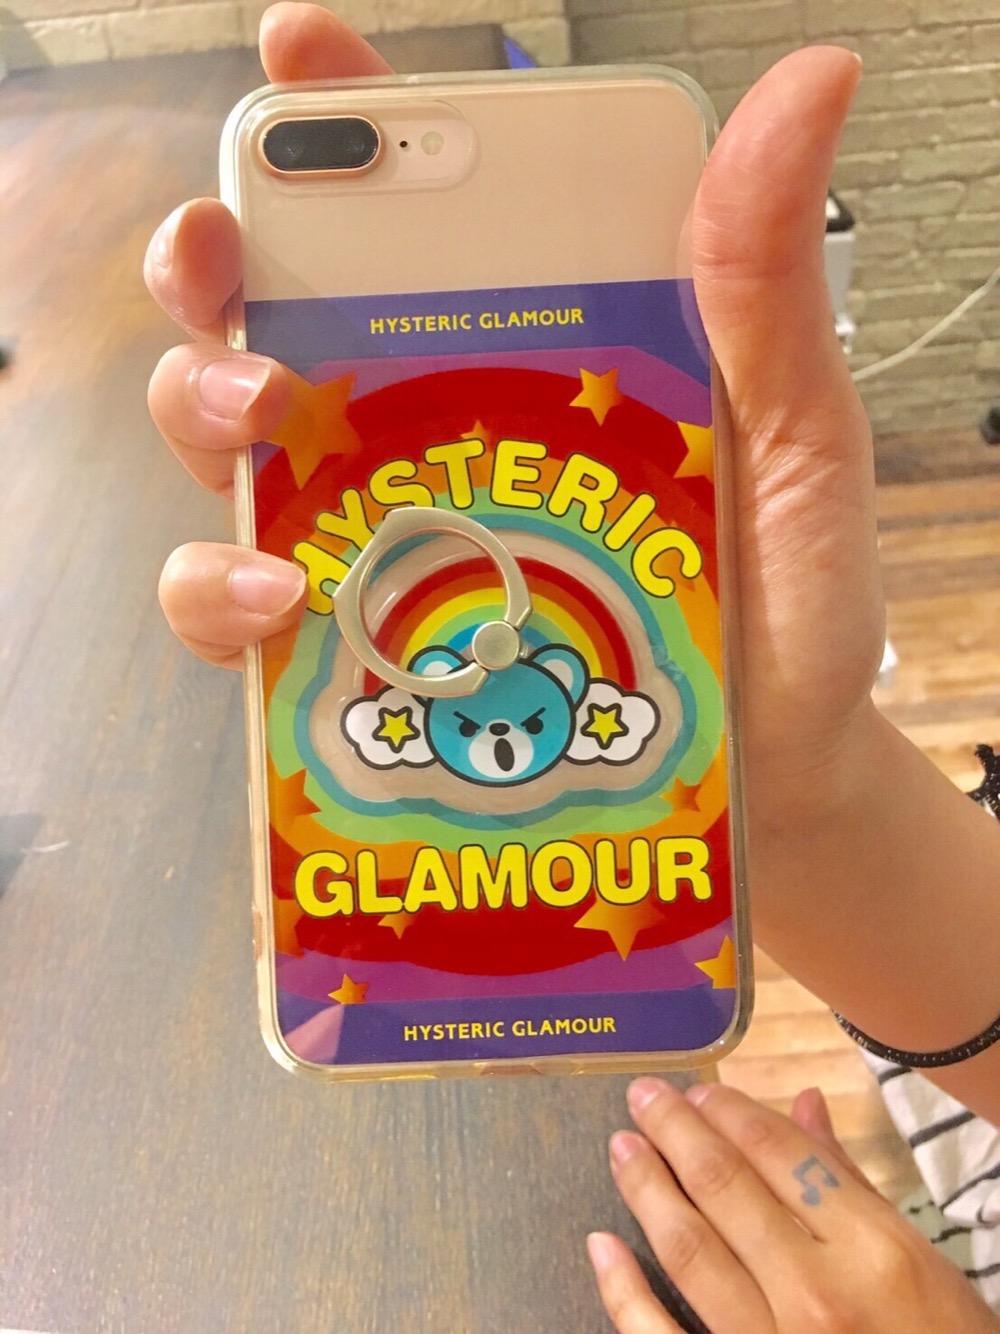 HYSTERIC GLAMOURアミュプラザ博多店